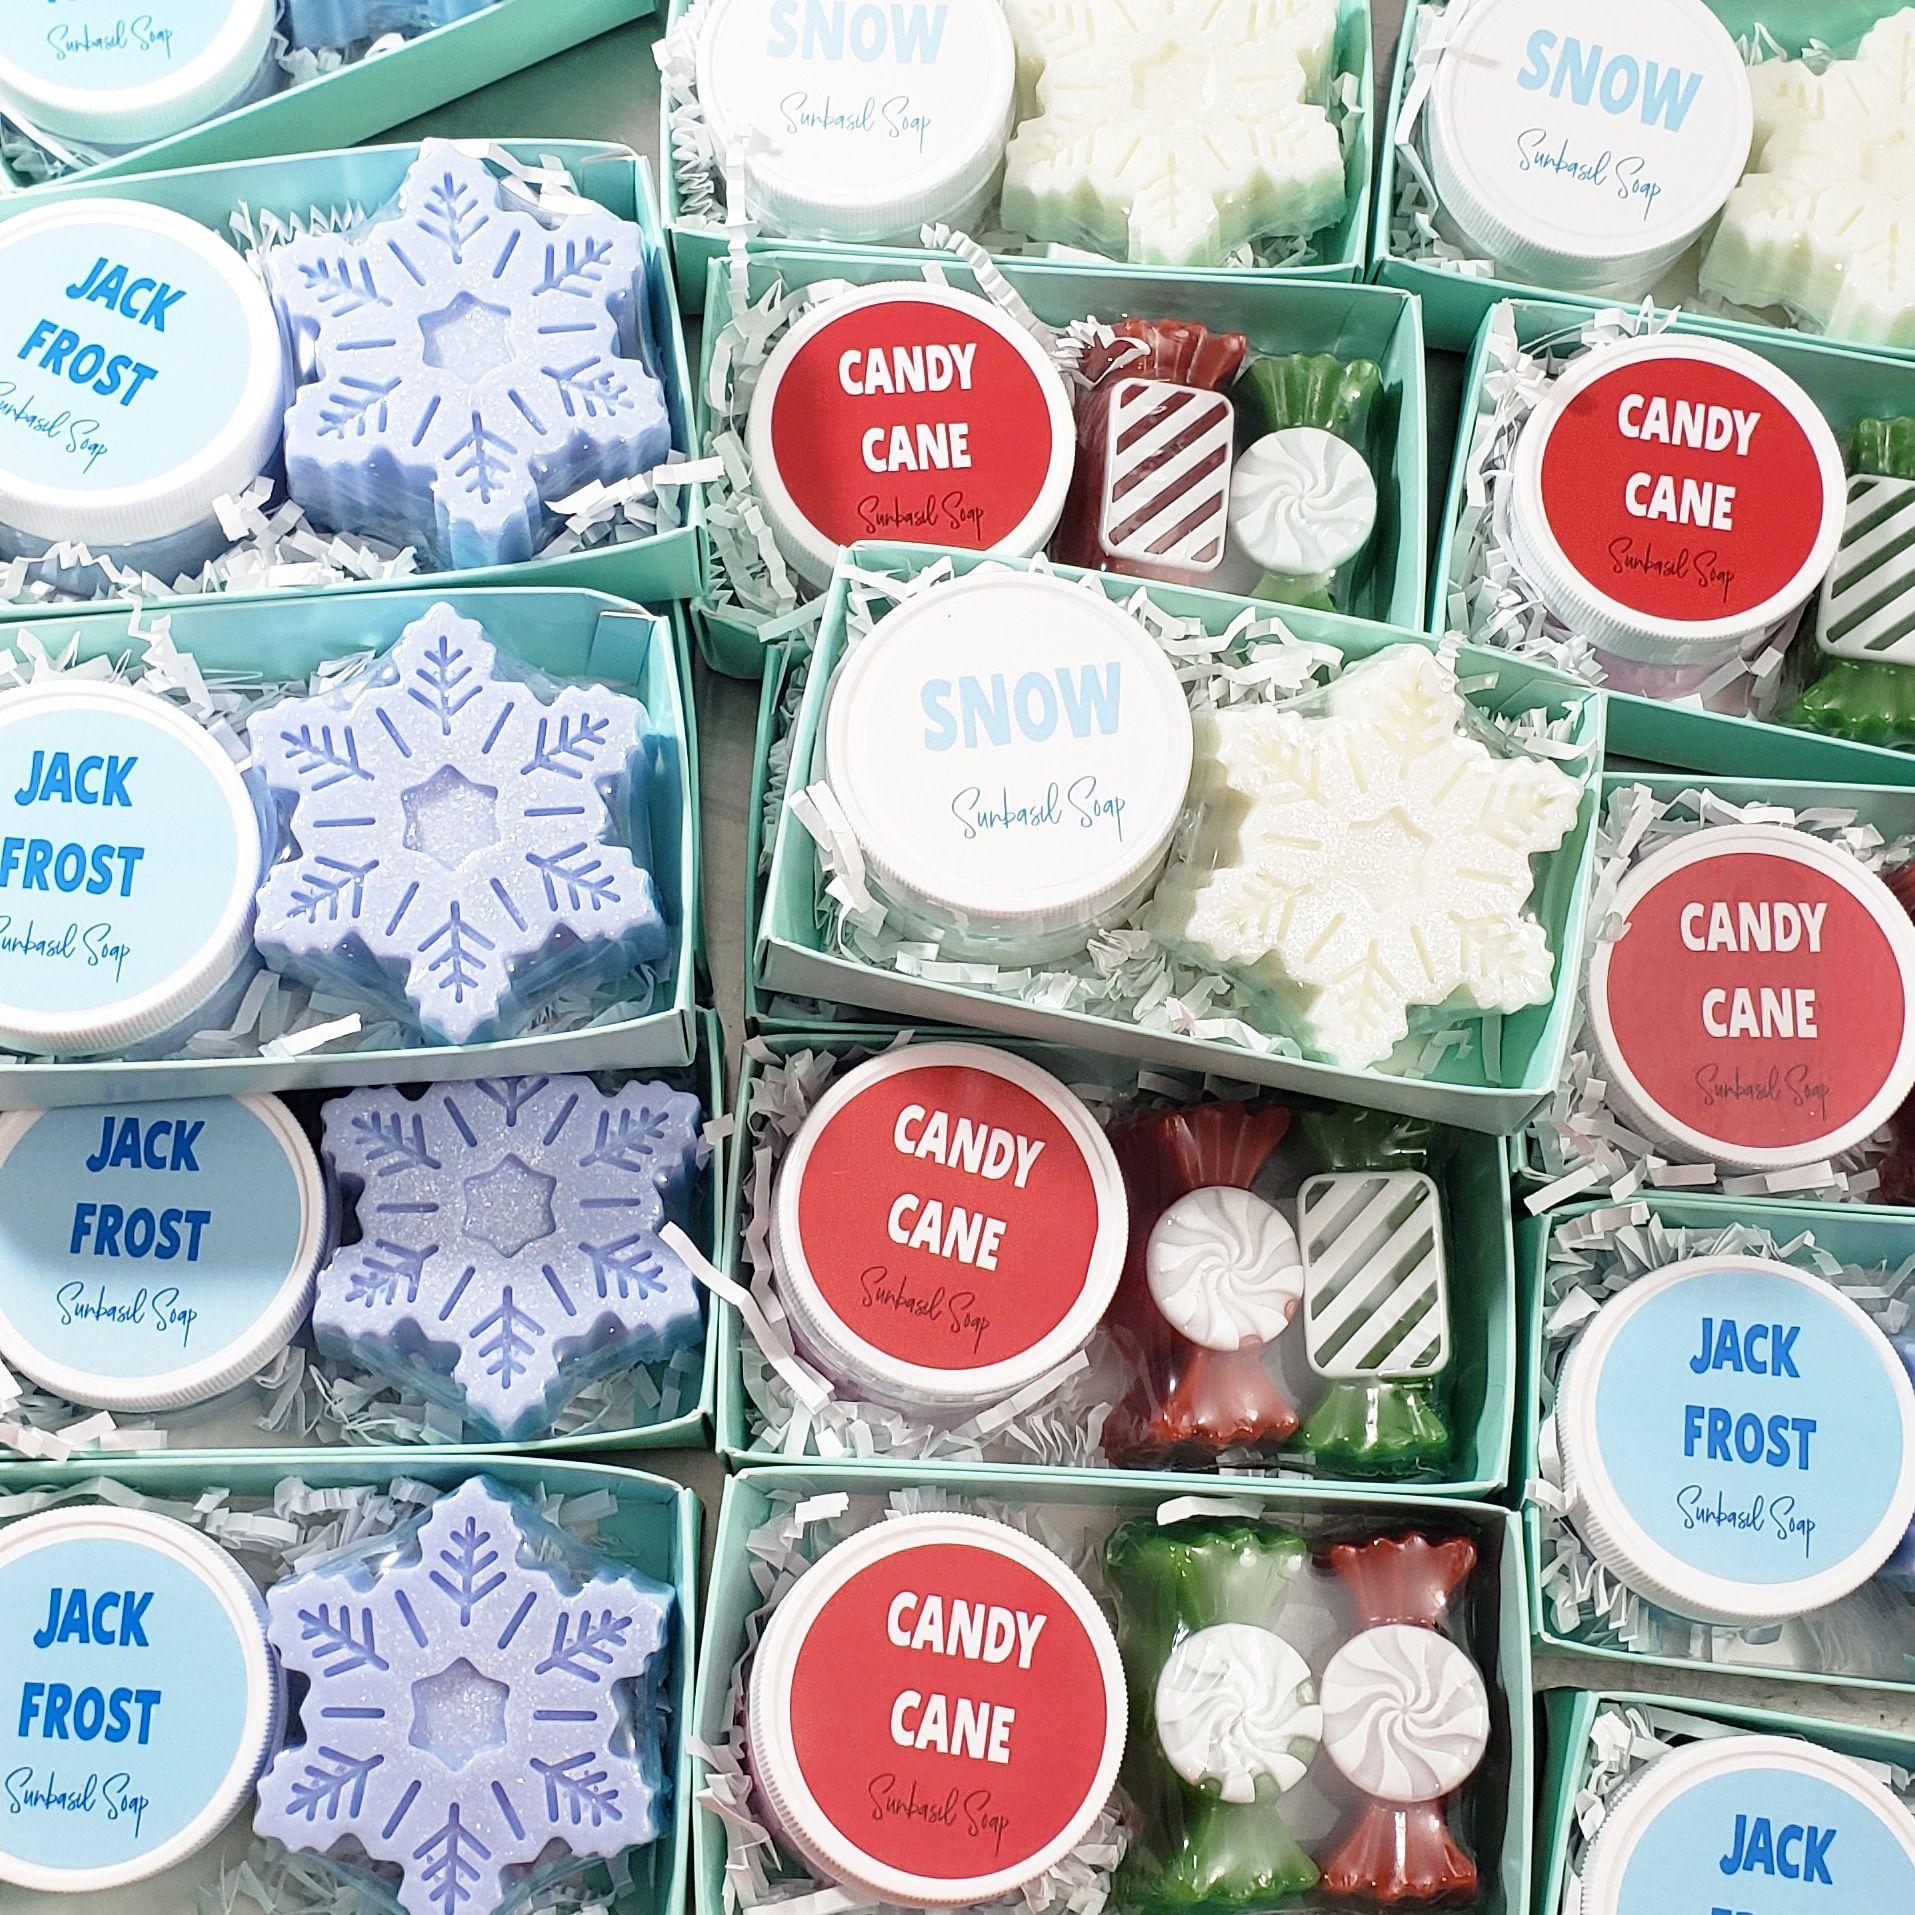 Sunbasil Soap Bath And Body Gifts Handmade Soap Gift Sets Small Christmas Gifts Handmade Soap Gift Set Handmade Soap Gifts